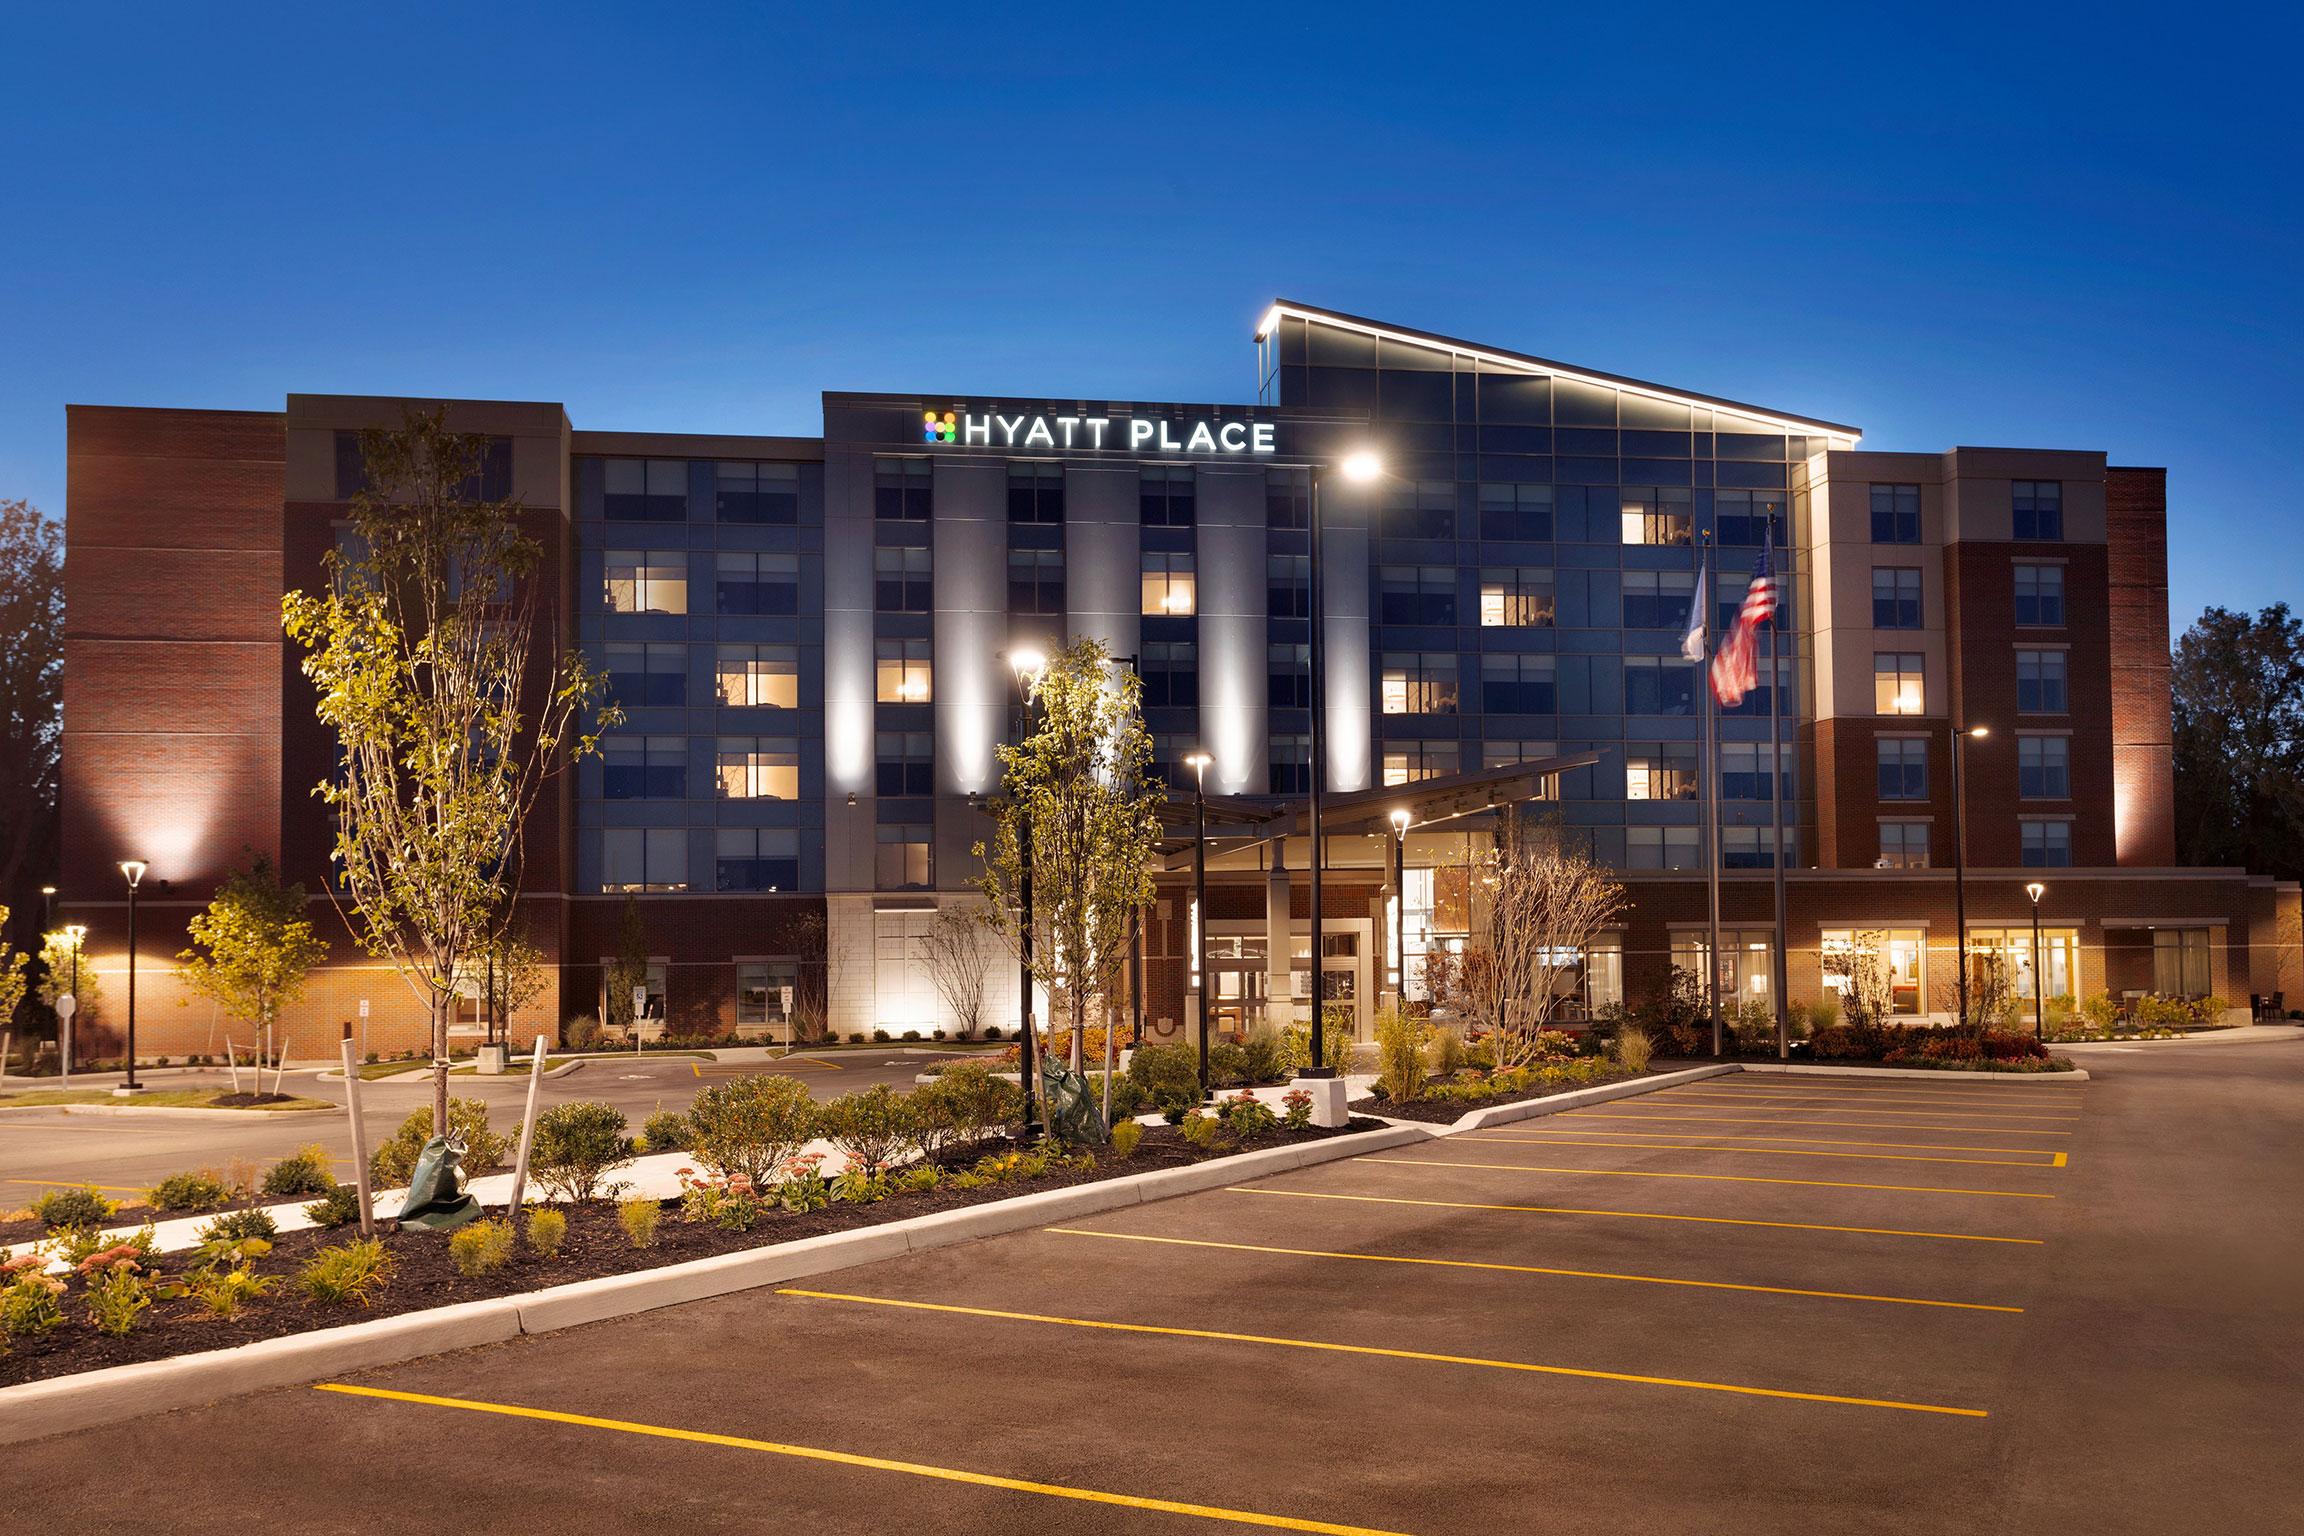 Hyatt+Place+Buffalo-Amherst+-+Exterior+-+1070783